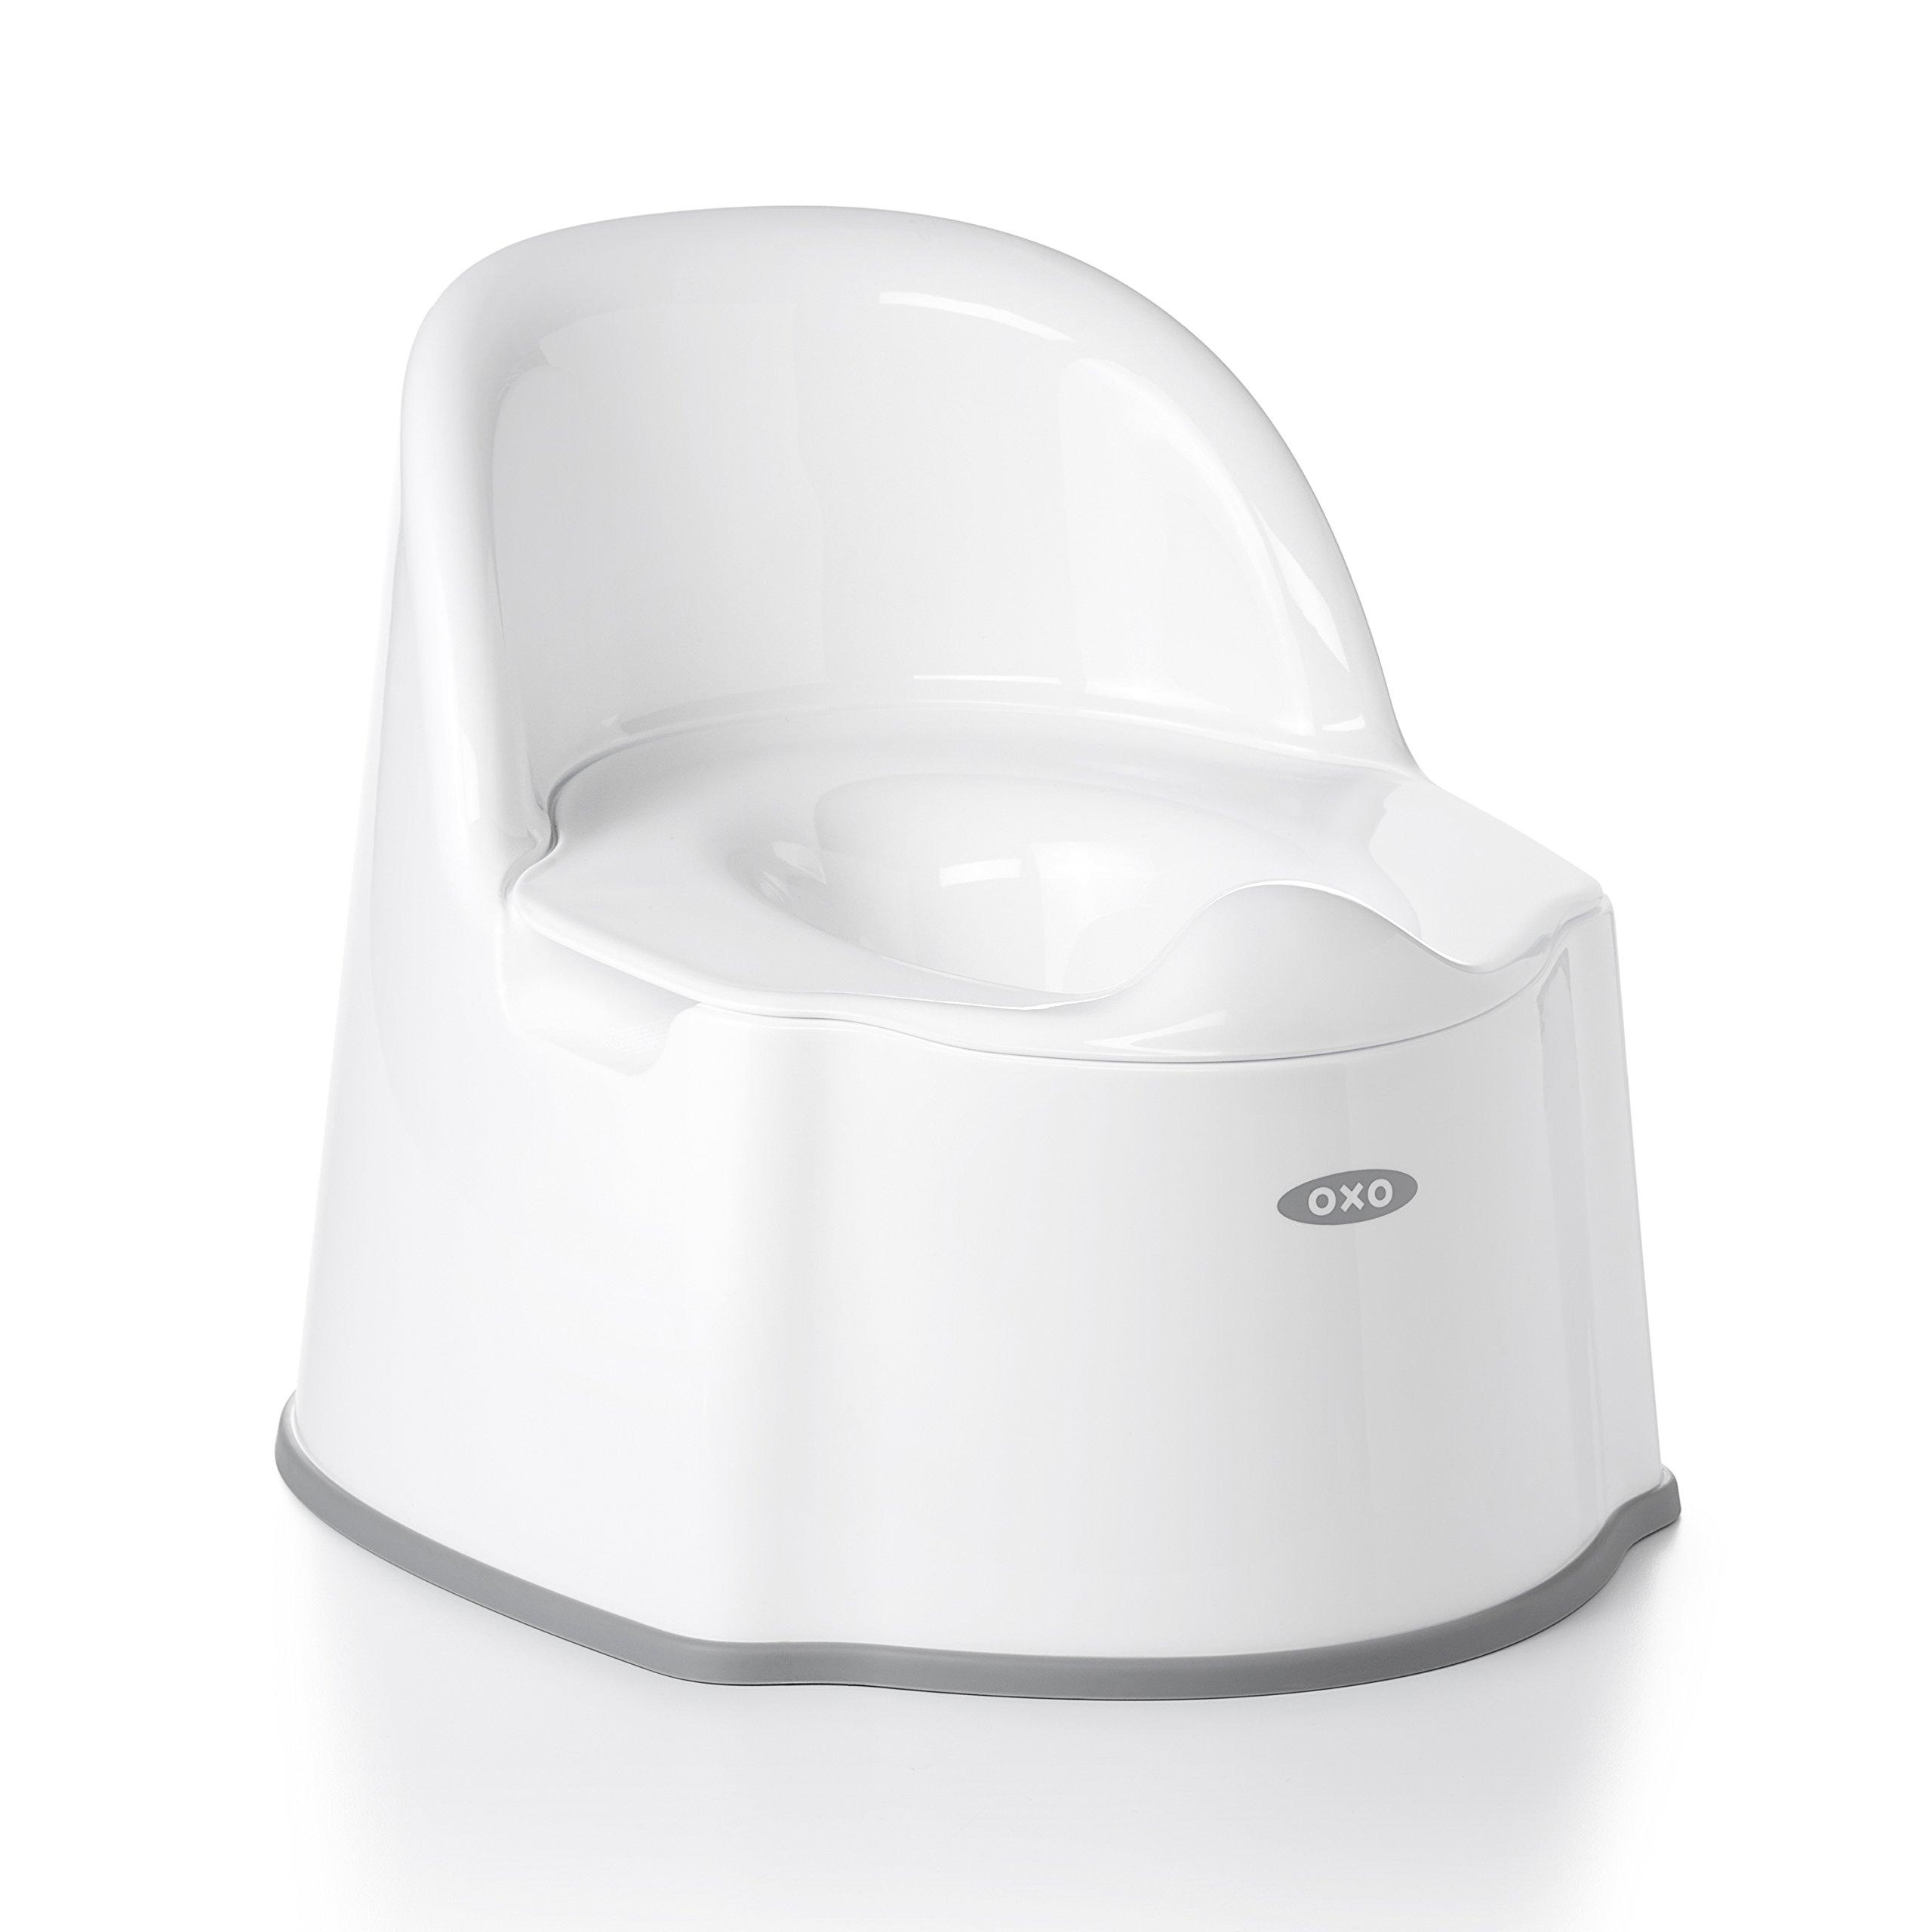 OXO Tot Potty Chair - White